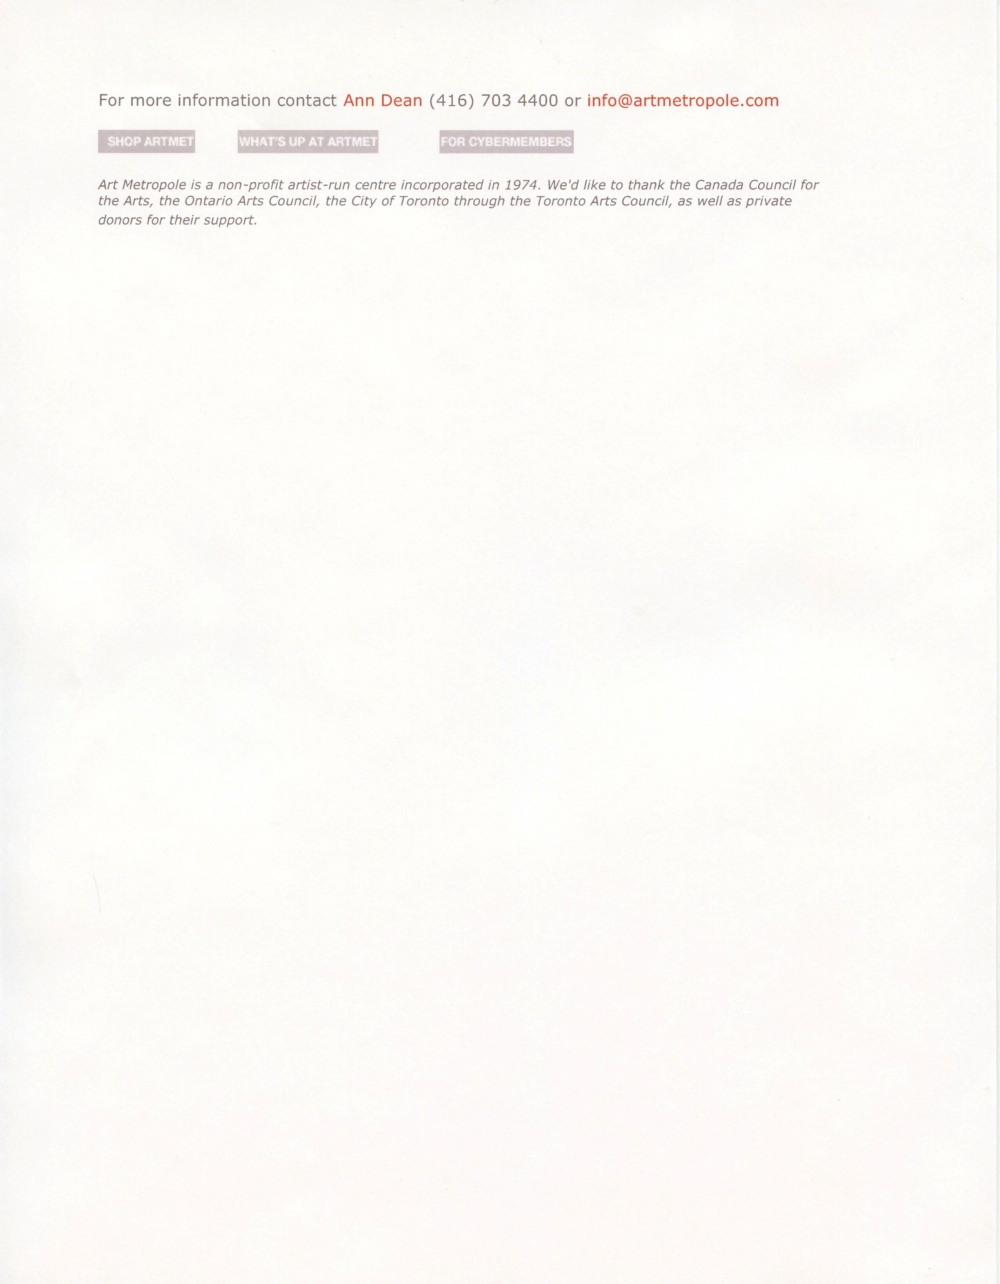 AMA0708, page 2